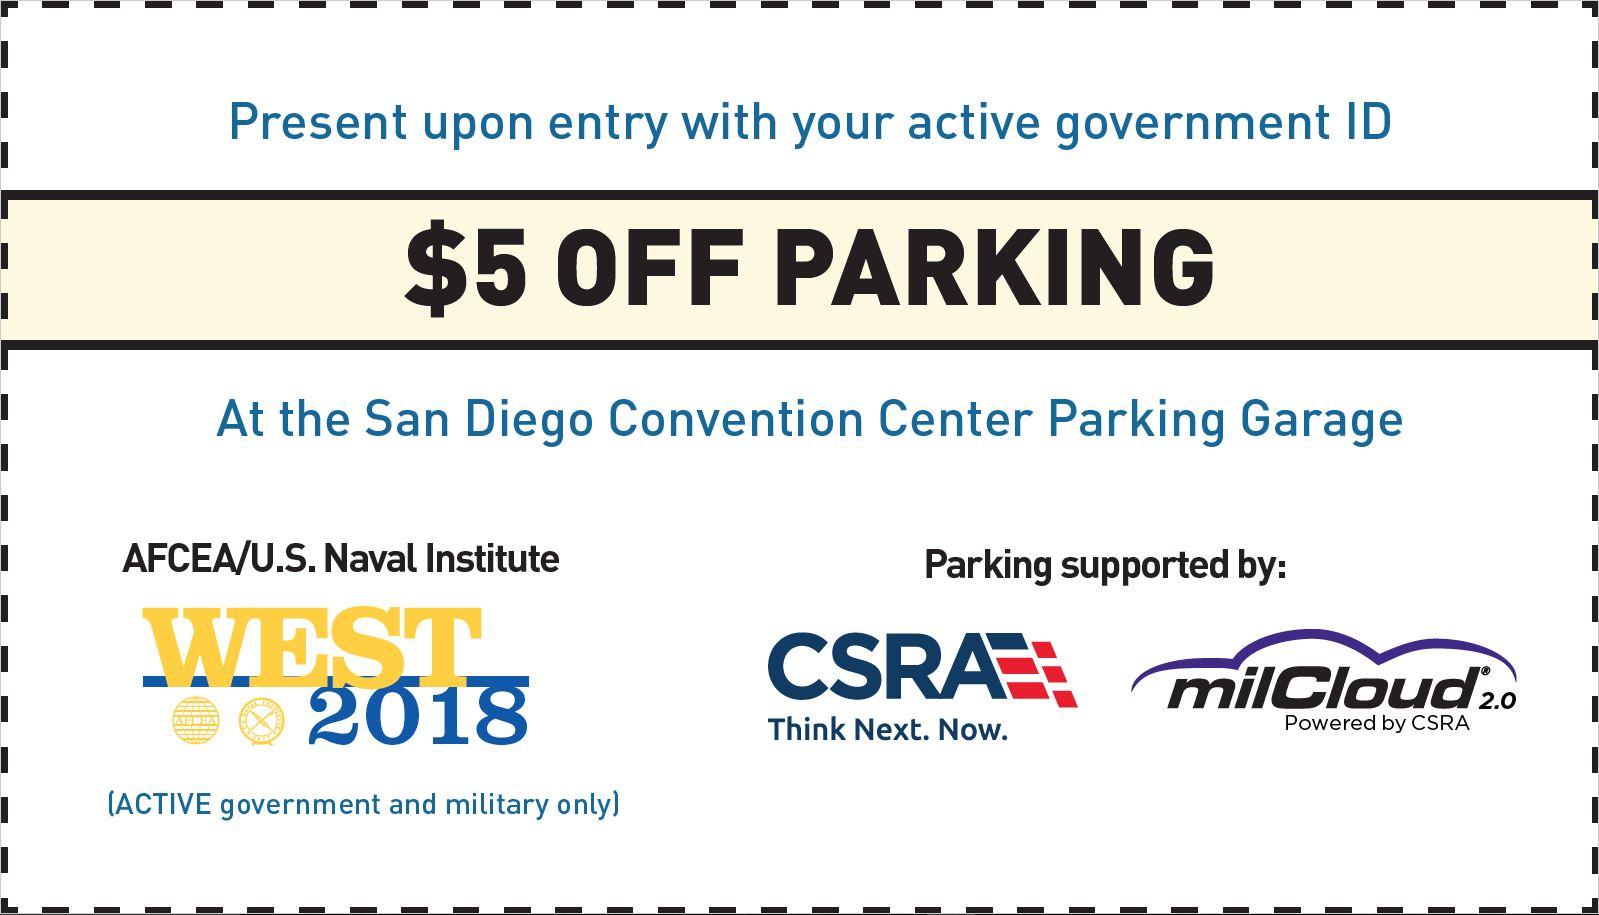 WEST_parking_coupon